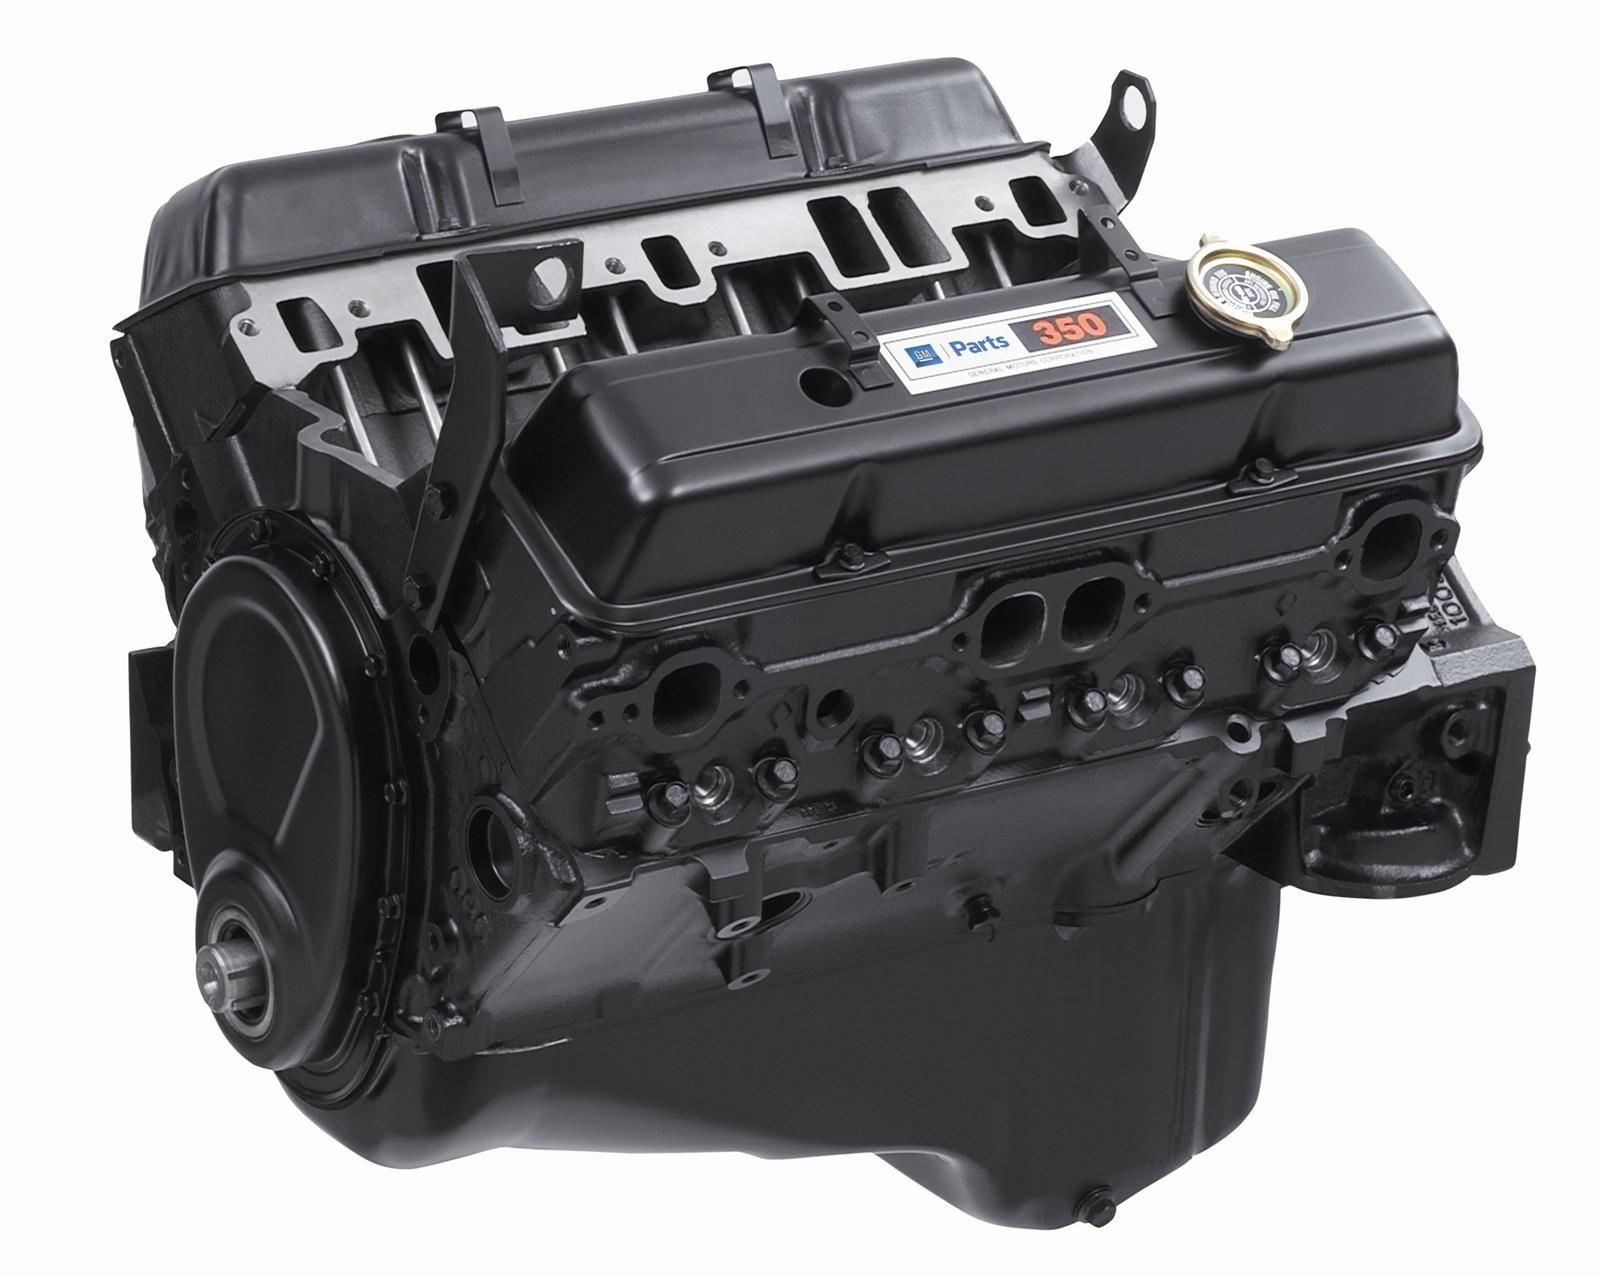 Chevrolet Performance 350 C.I.D. Base 195 HP Engine